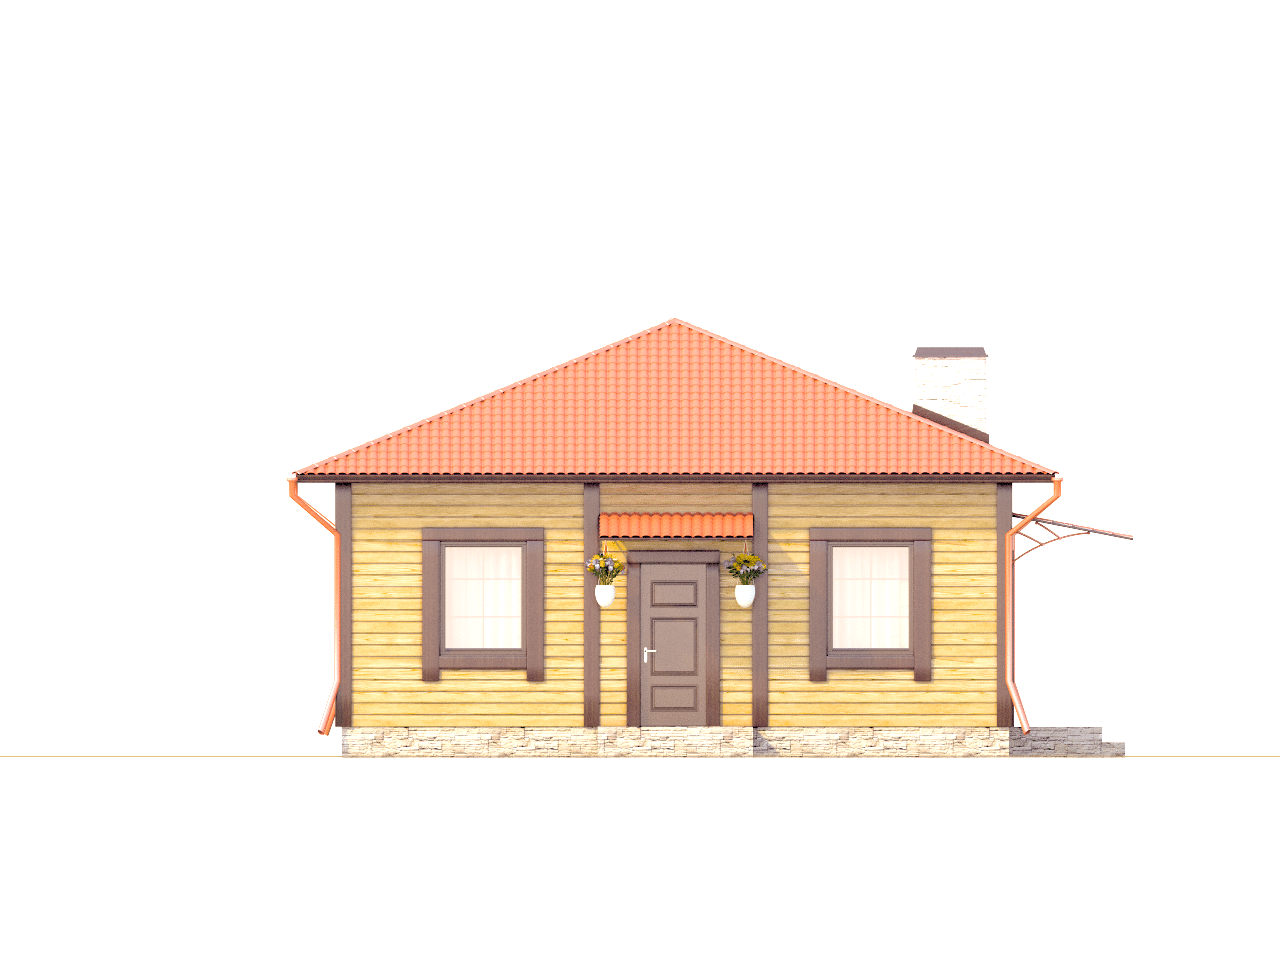 Фасад одноэтажного дома с террасой «КО-73» - спереди